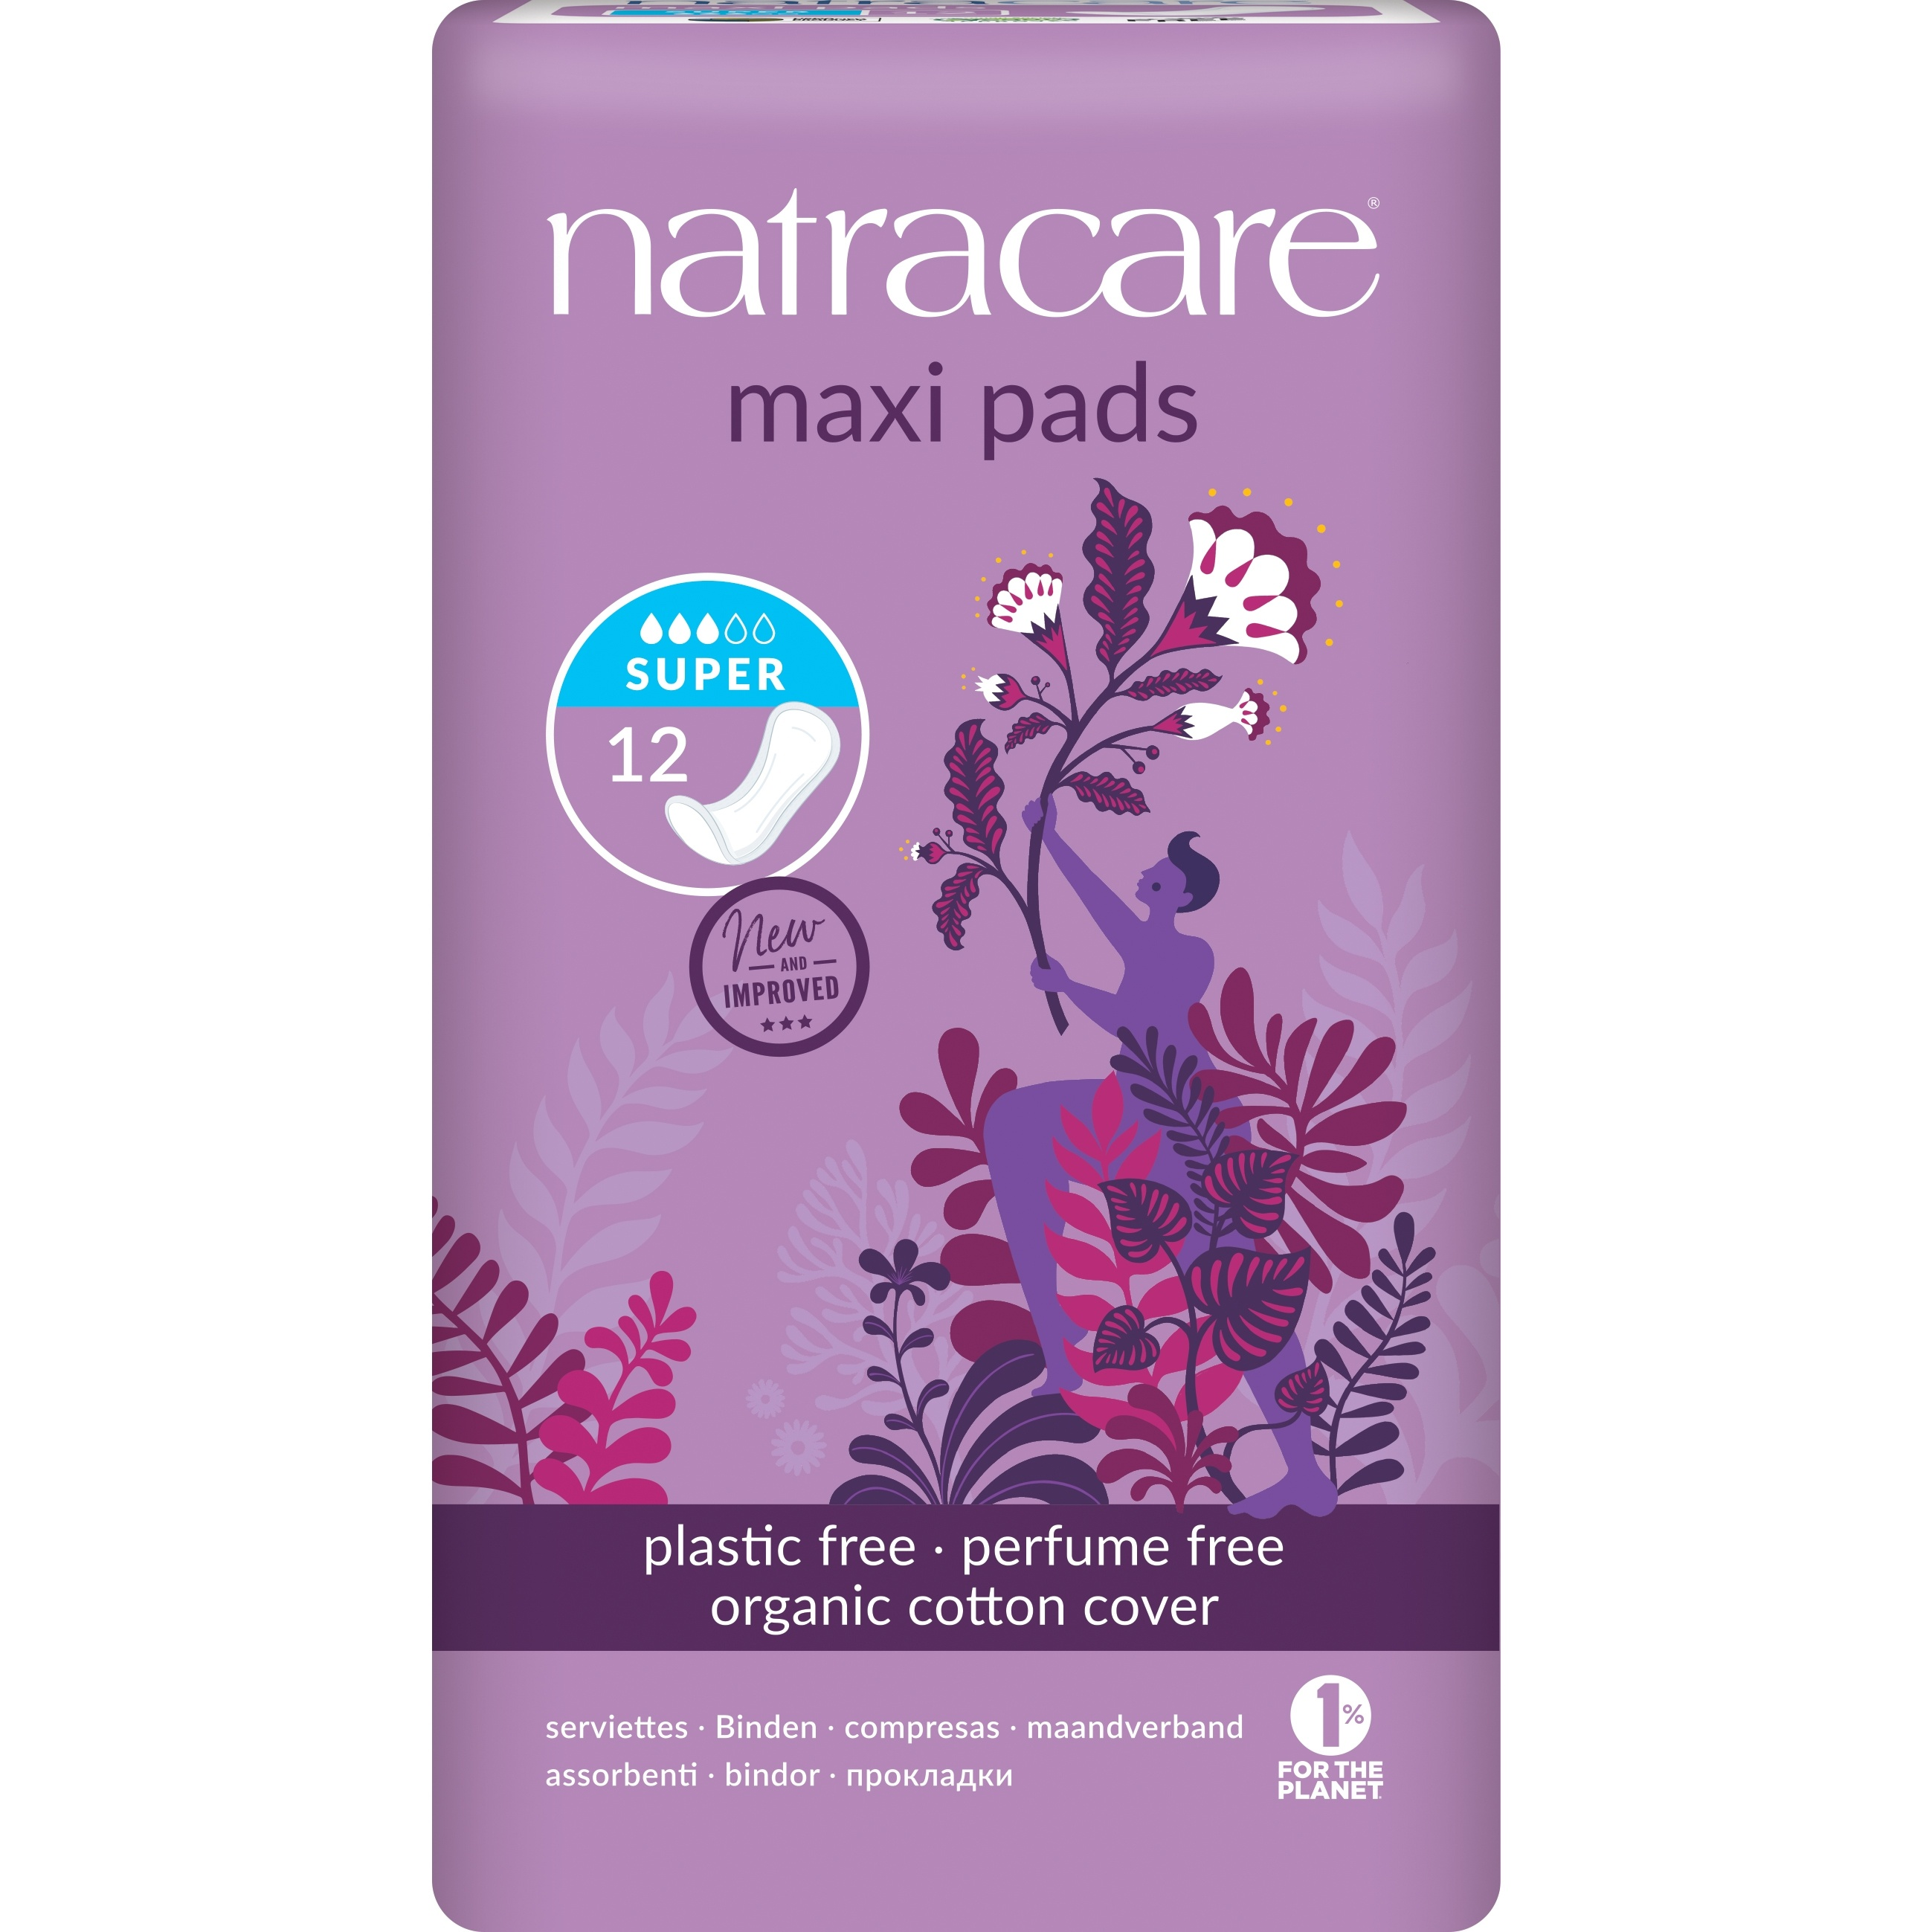 Natracare Super Natural Maxi Pads 12's